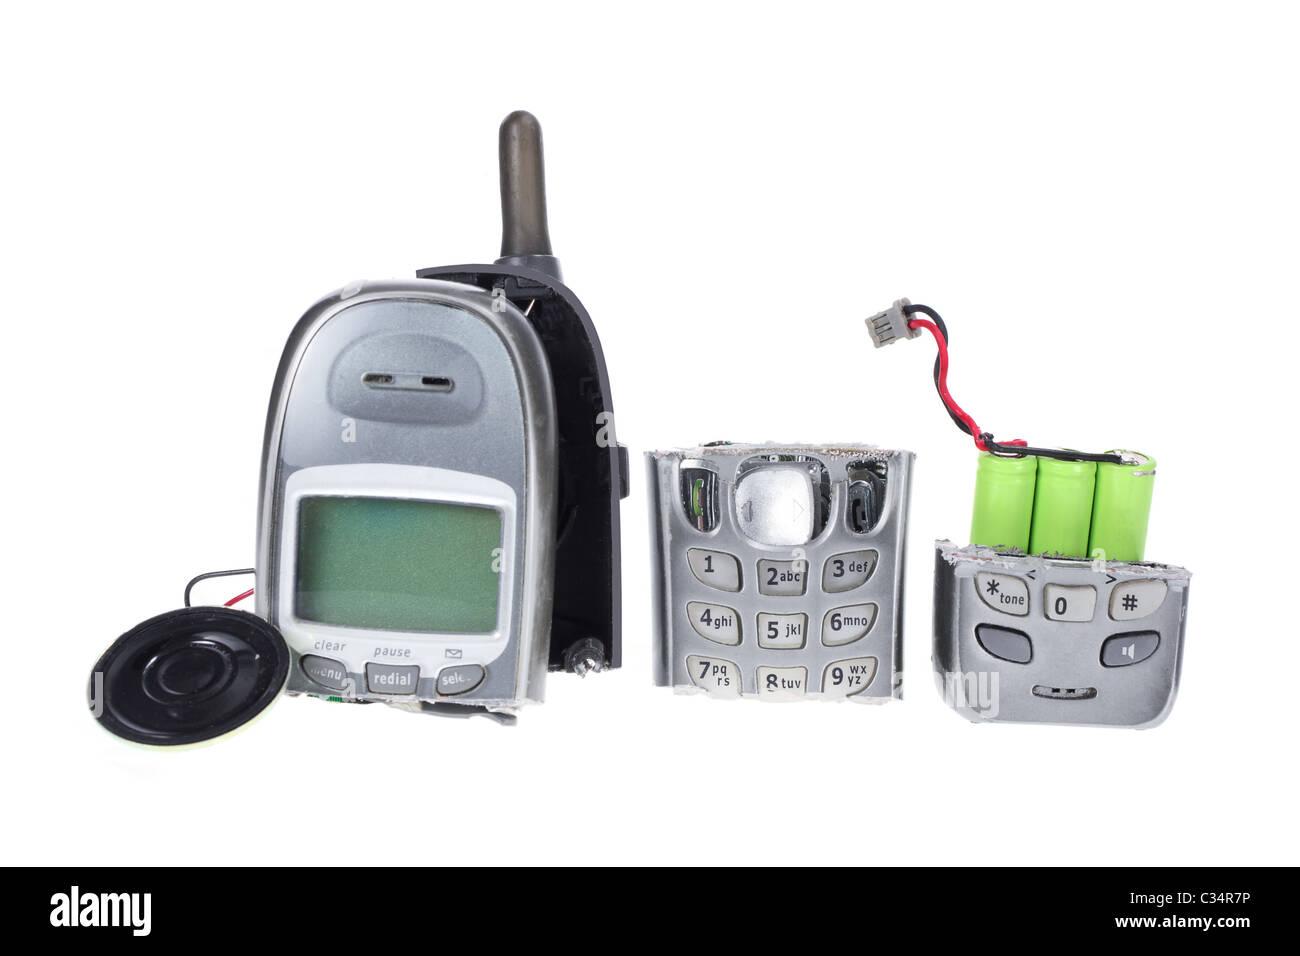 Broken Mobile Phone - Stock Image